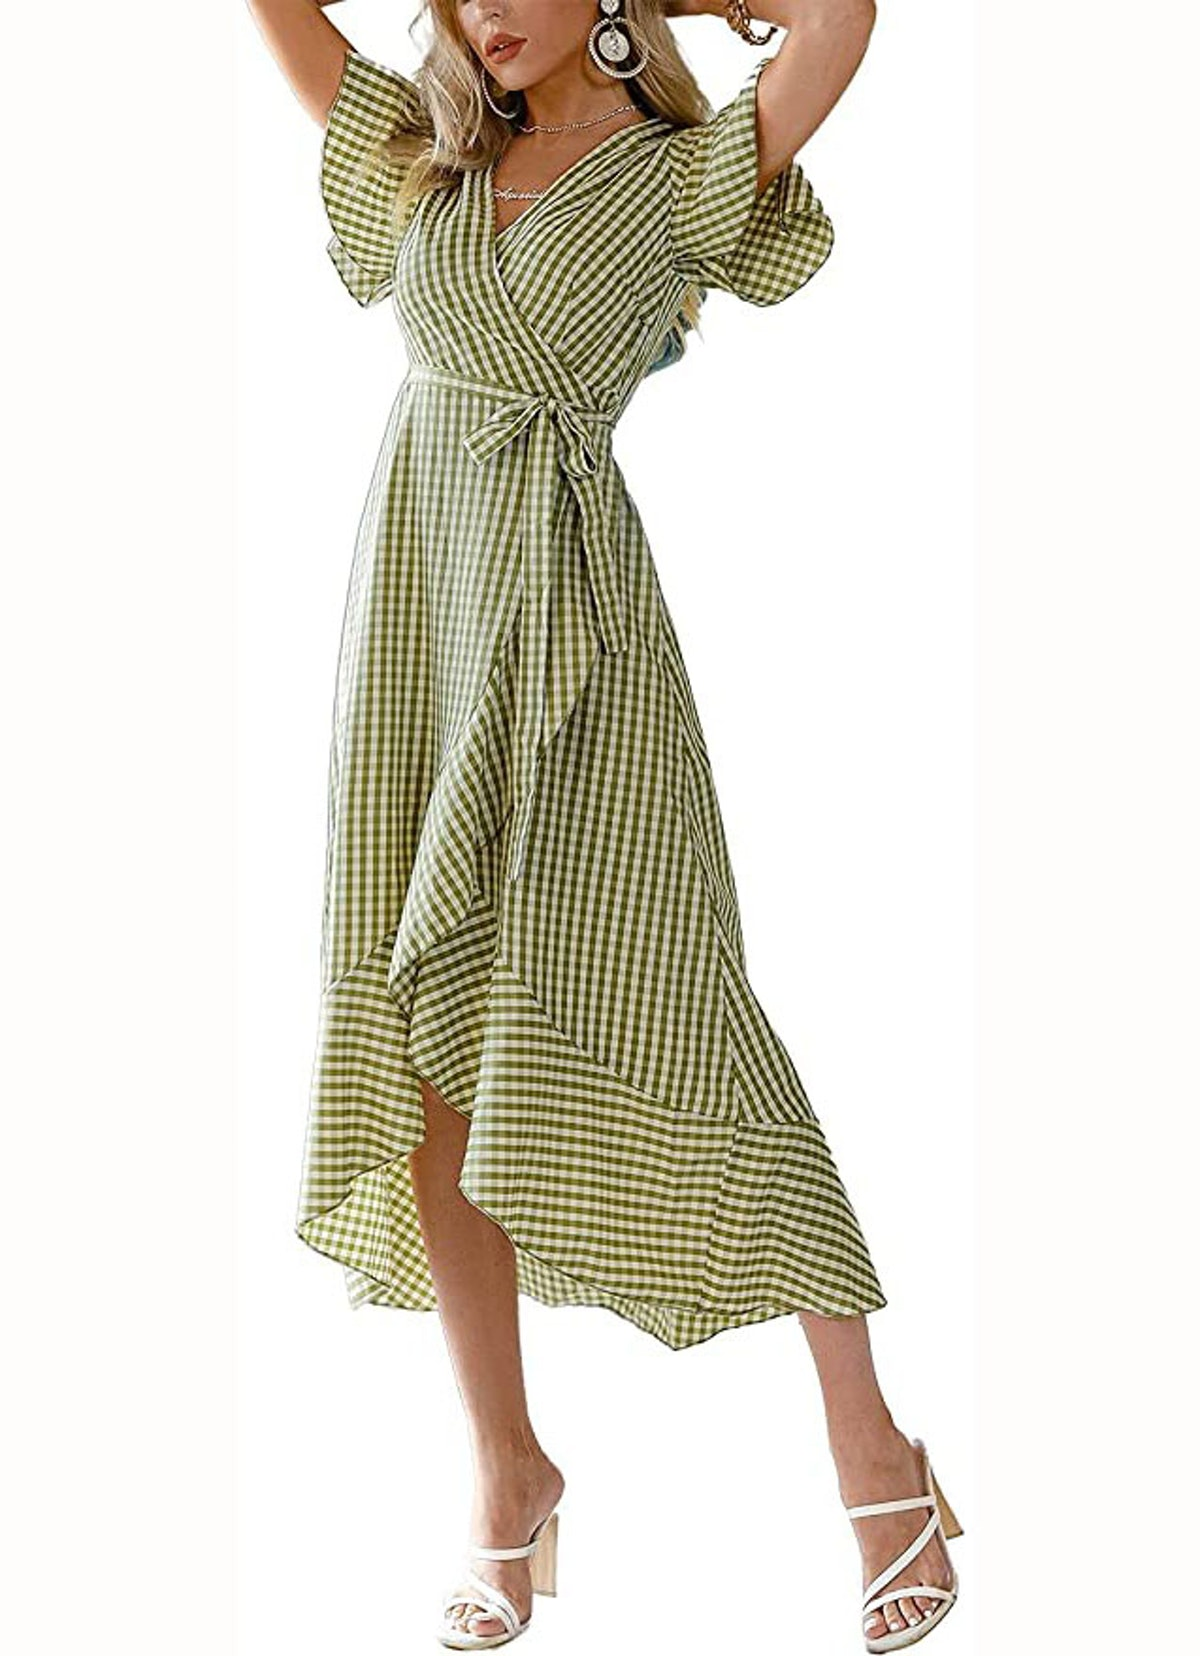 Miessial Summer Chiffon Ruffle Maxi Dress